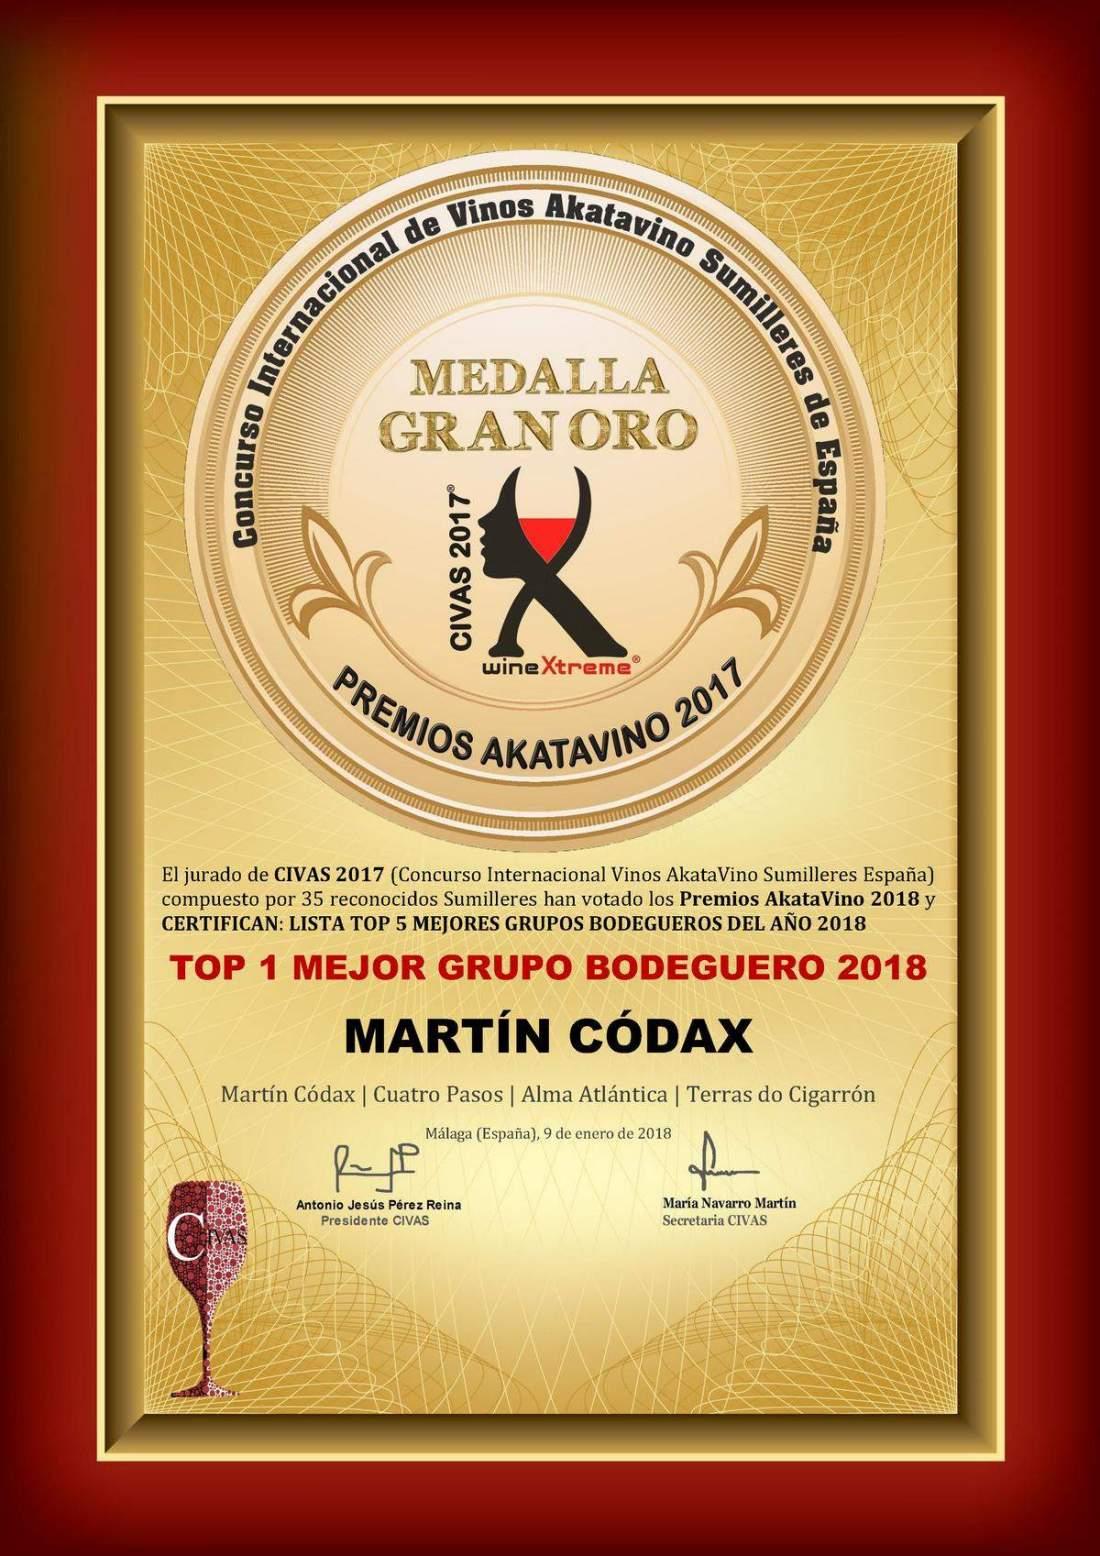 Martín Códax Diploma Mejor Grupo Bodeguero 2018 © Premios AkataVino